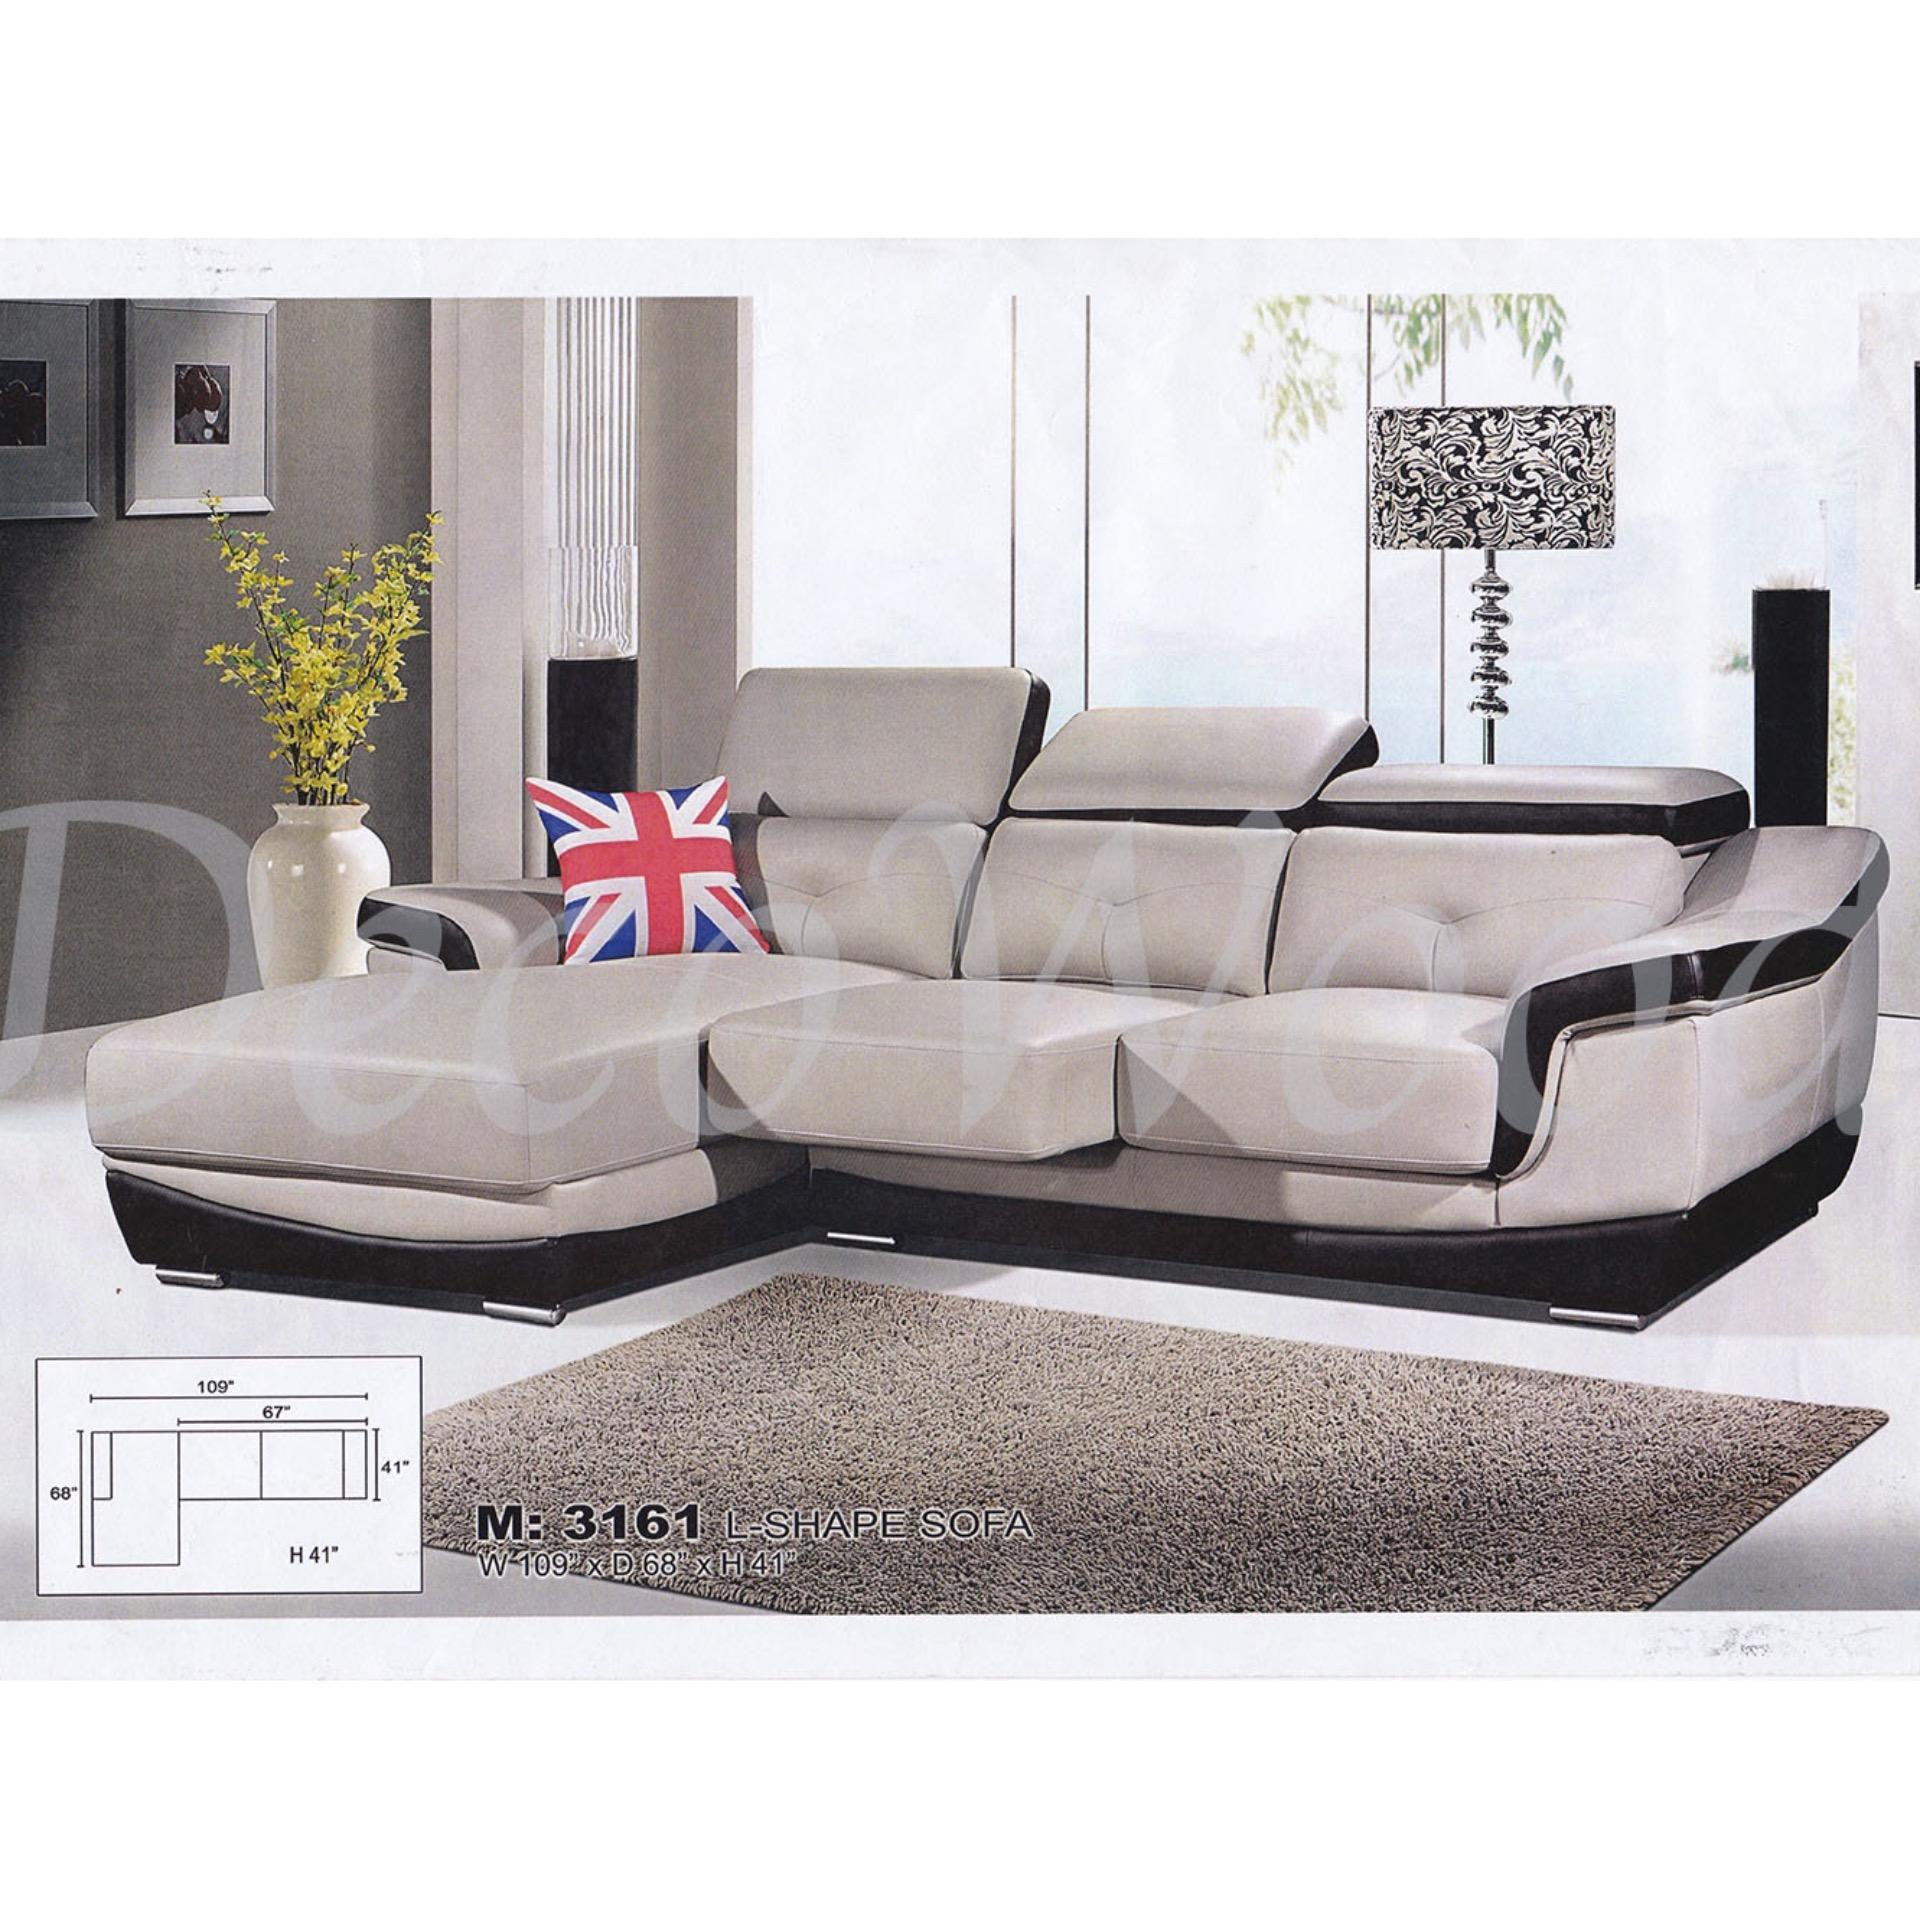 9 Feet Casa Leather L Shape Sofa C End 4 28 2021 12 00 Am